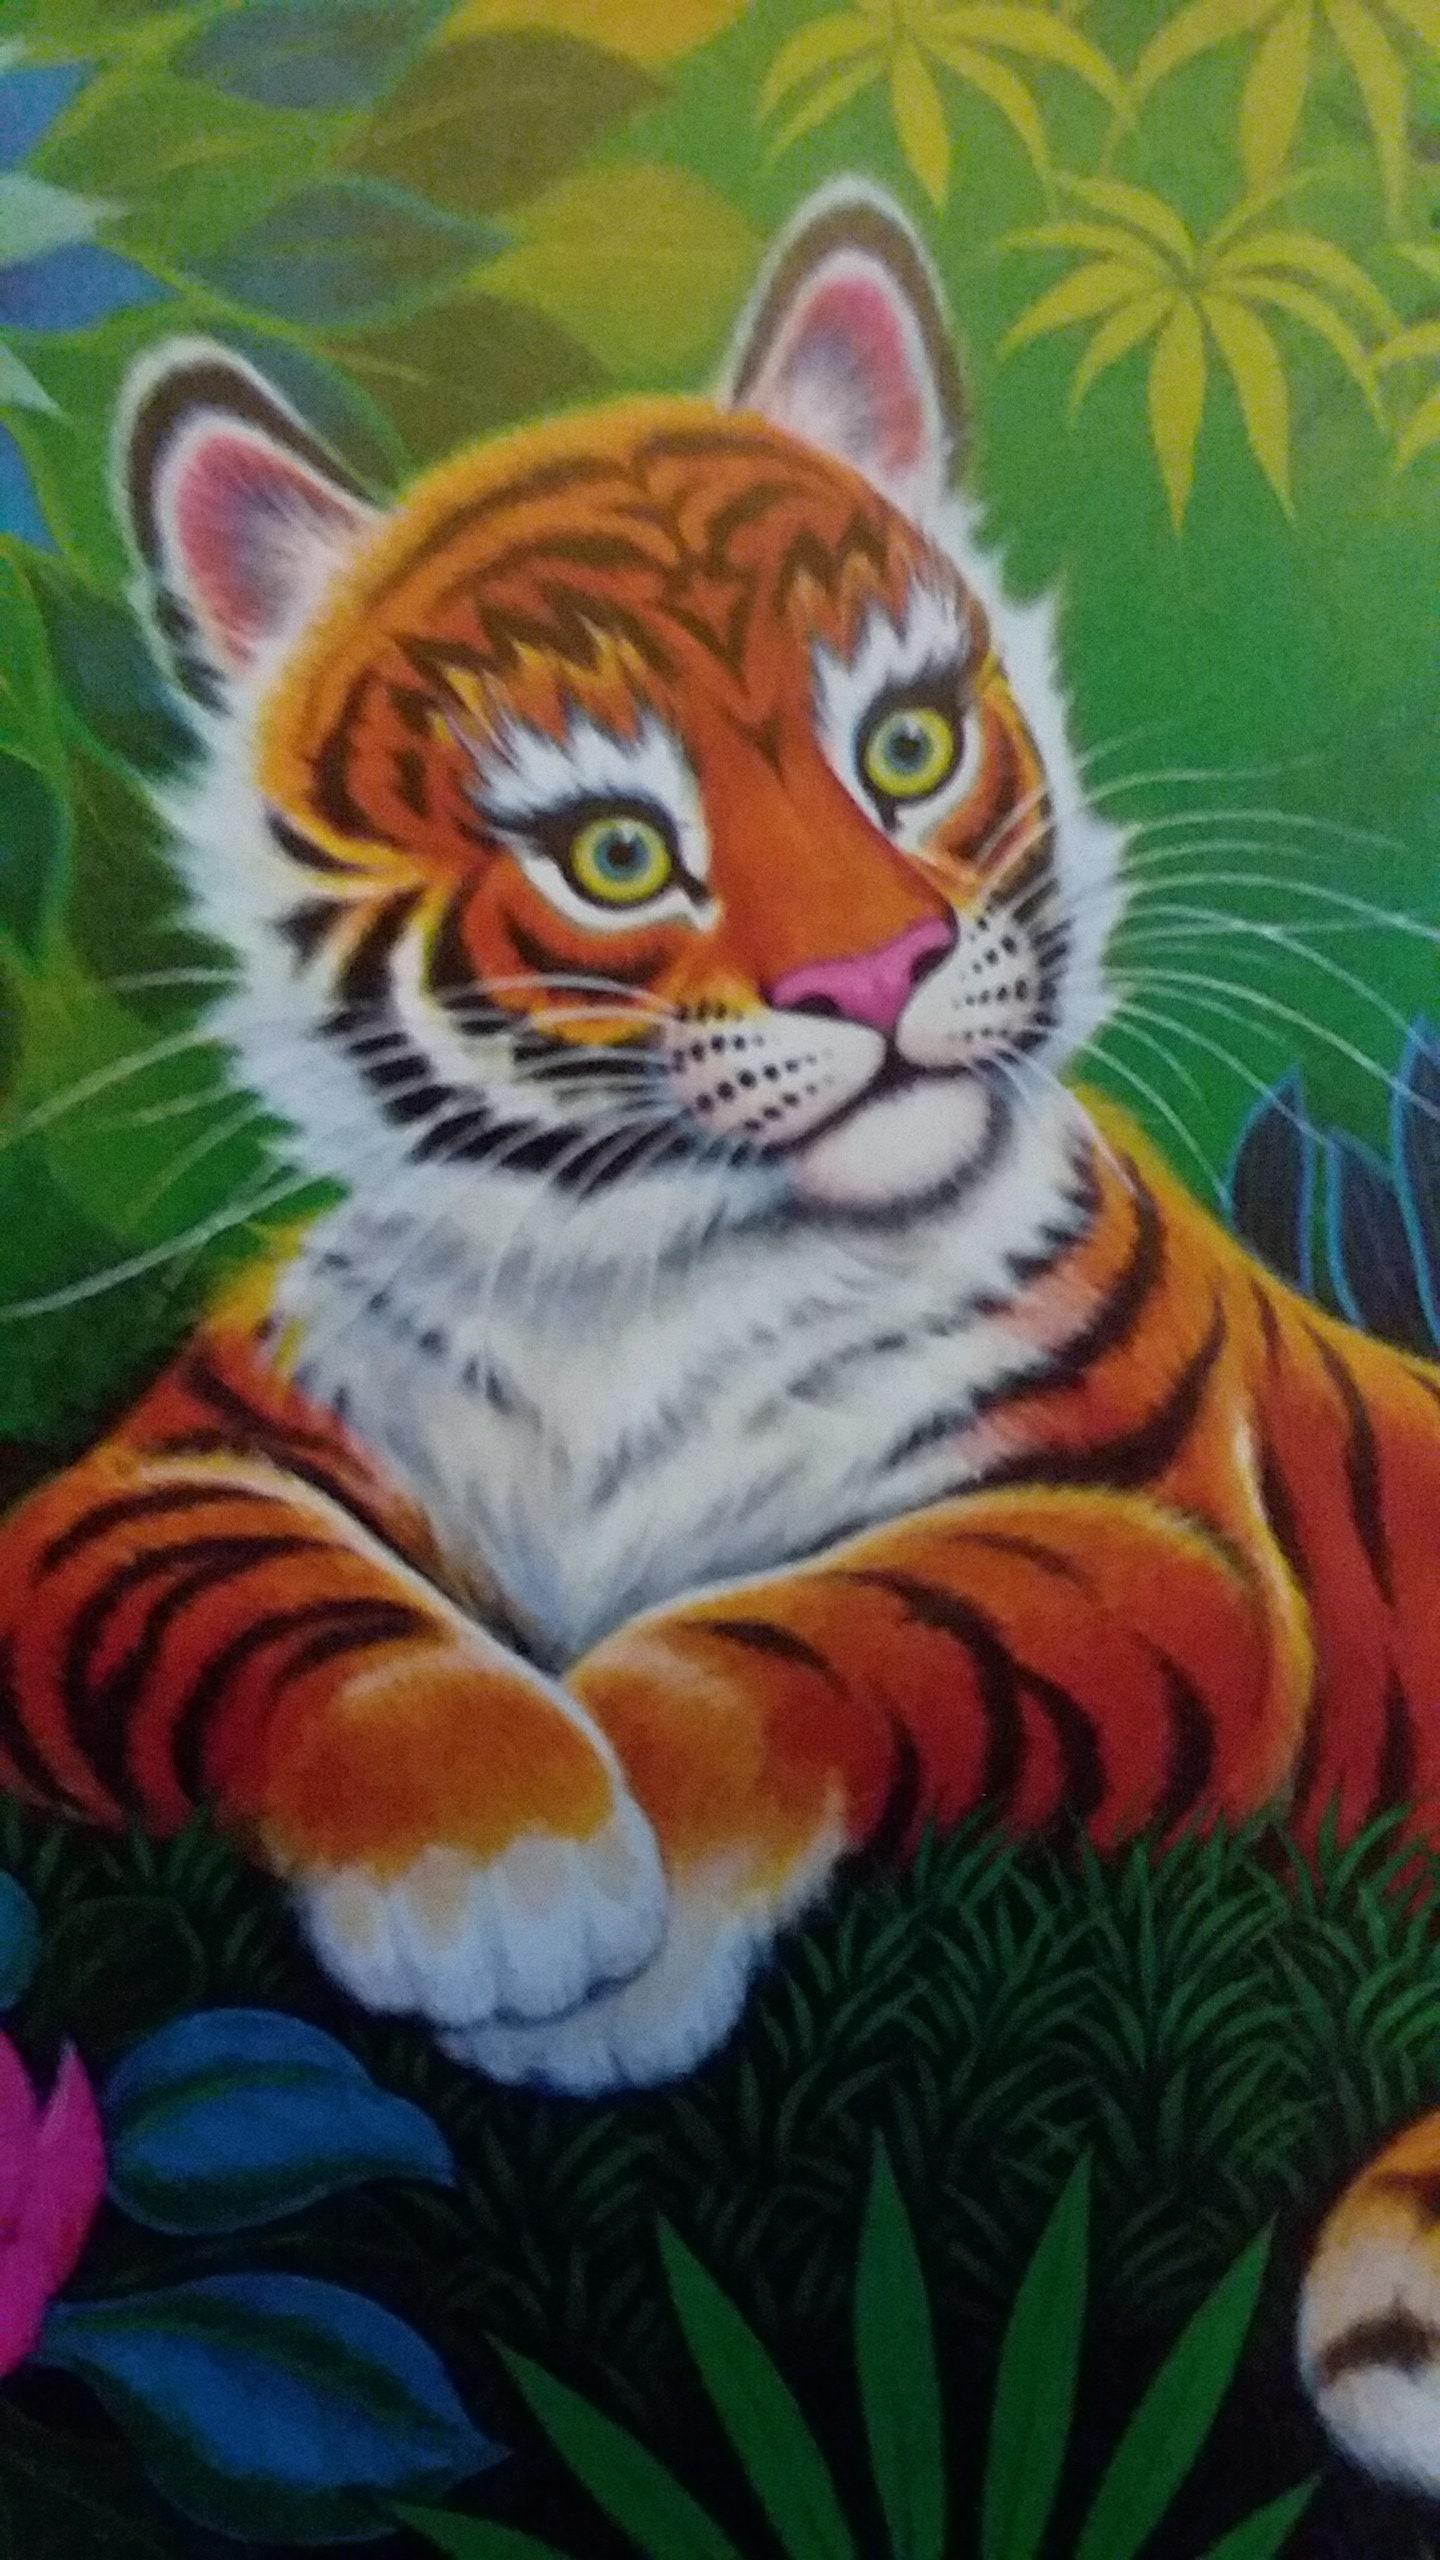 Vintage K Chin art print lithograph Lion Butterfly flowers Lemurs jungle 1970s wall art home decor.